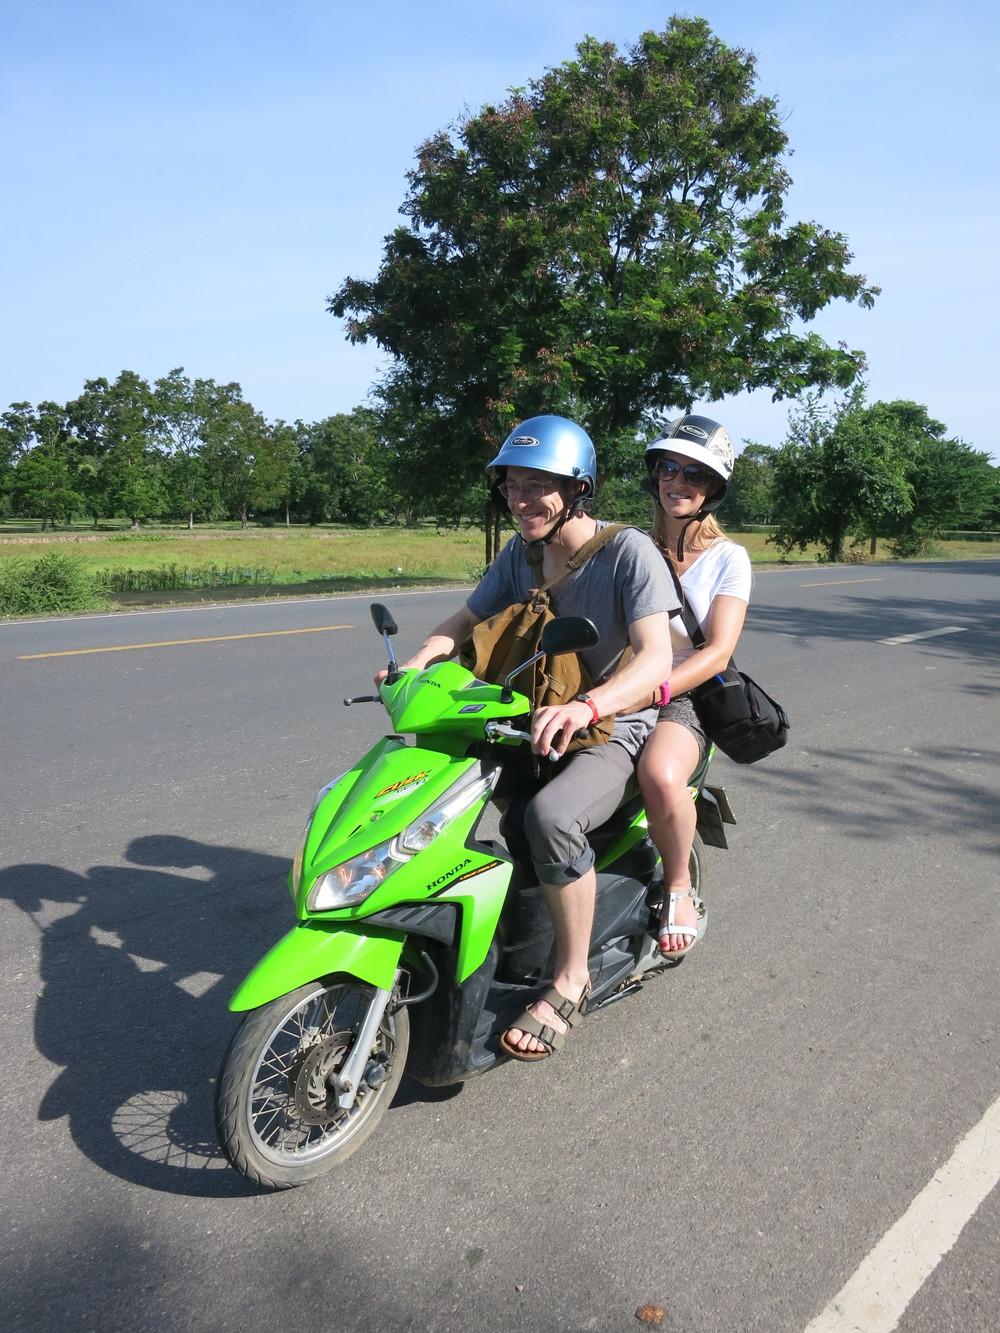 Motor bikes!